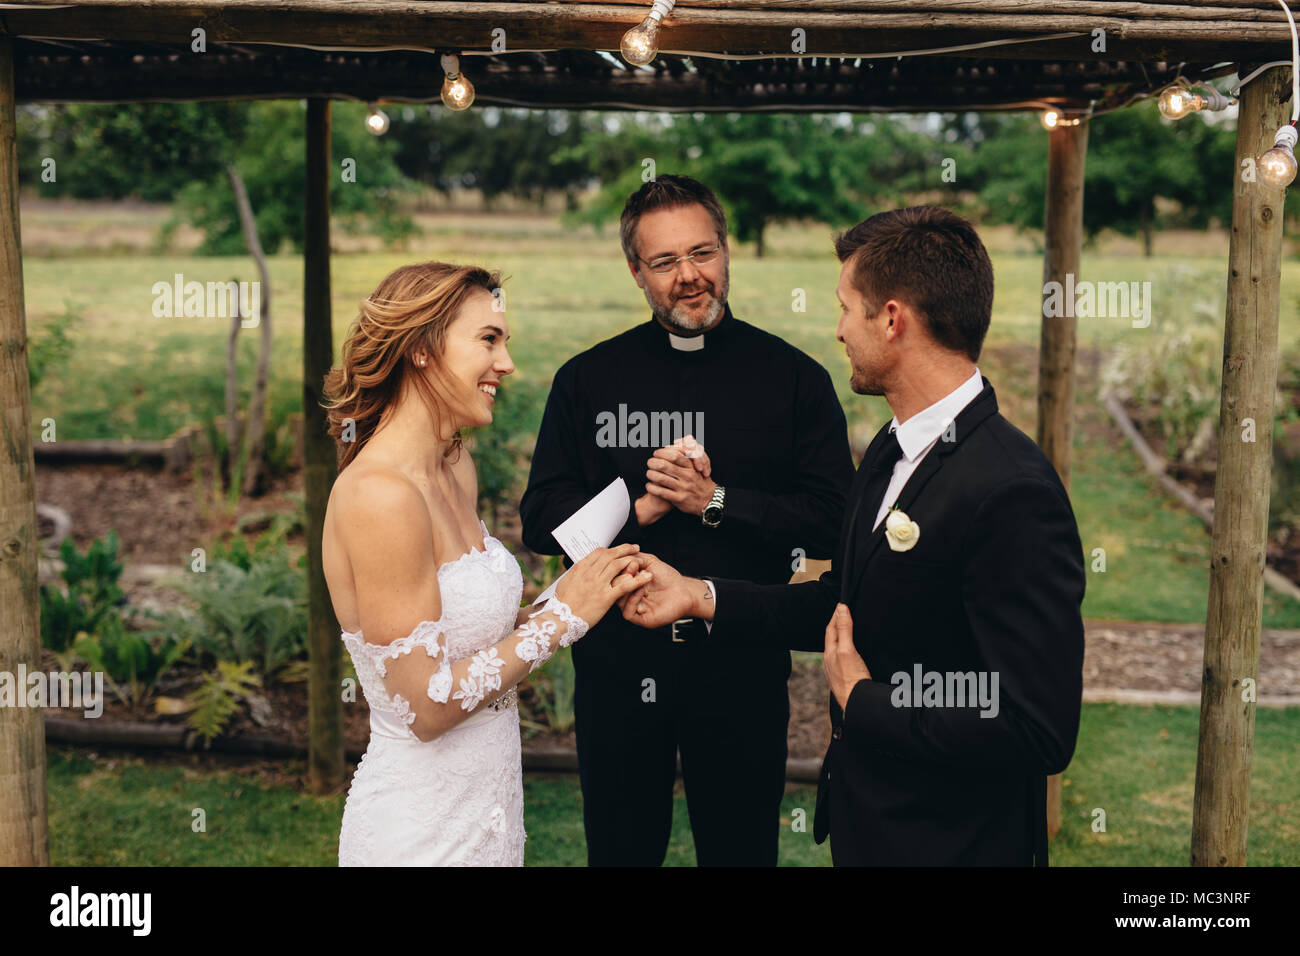 Wedding oath of the bride and groom 6